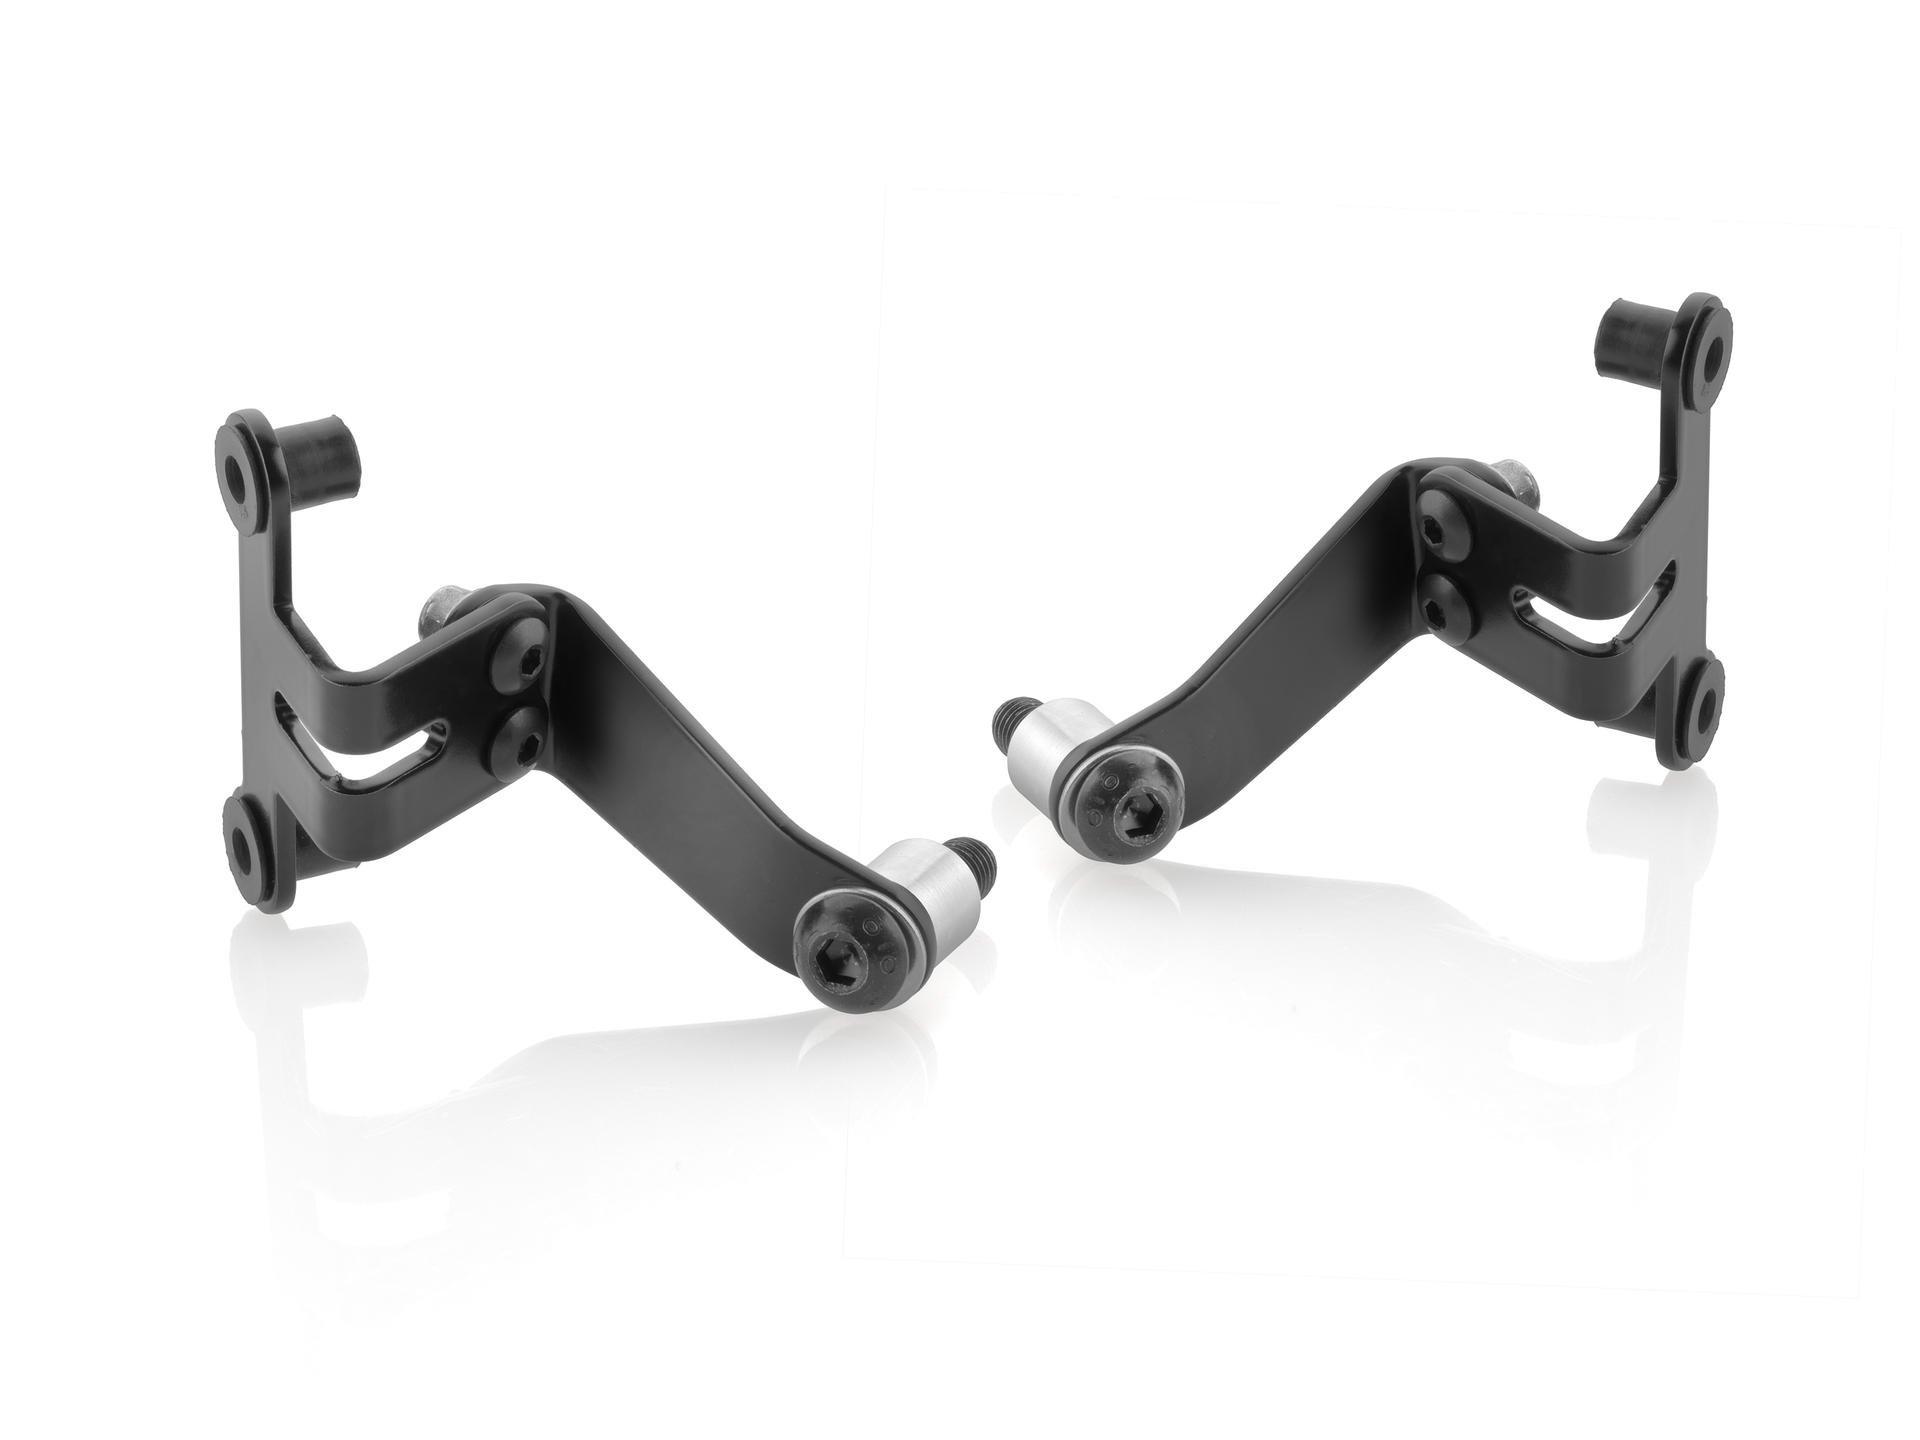 Кронштейн обтекателя Rizoma для Ducati Scrambler 15-17